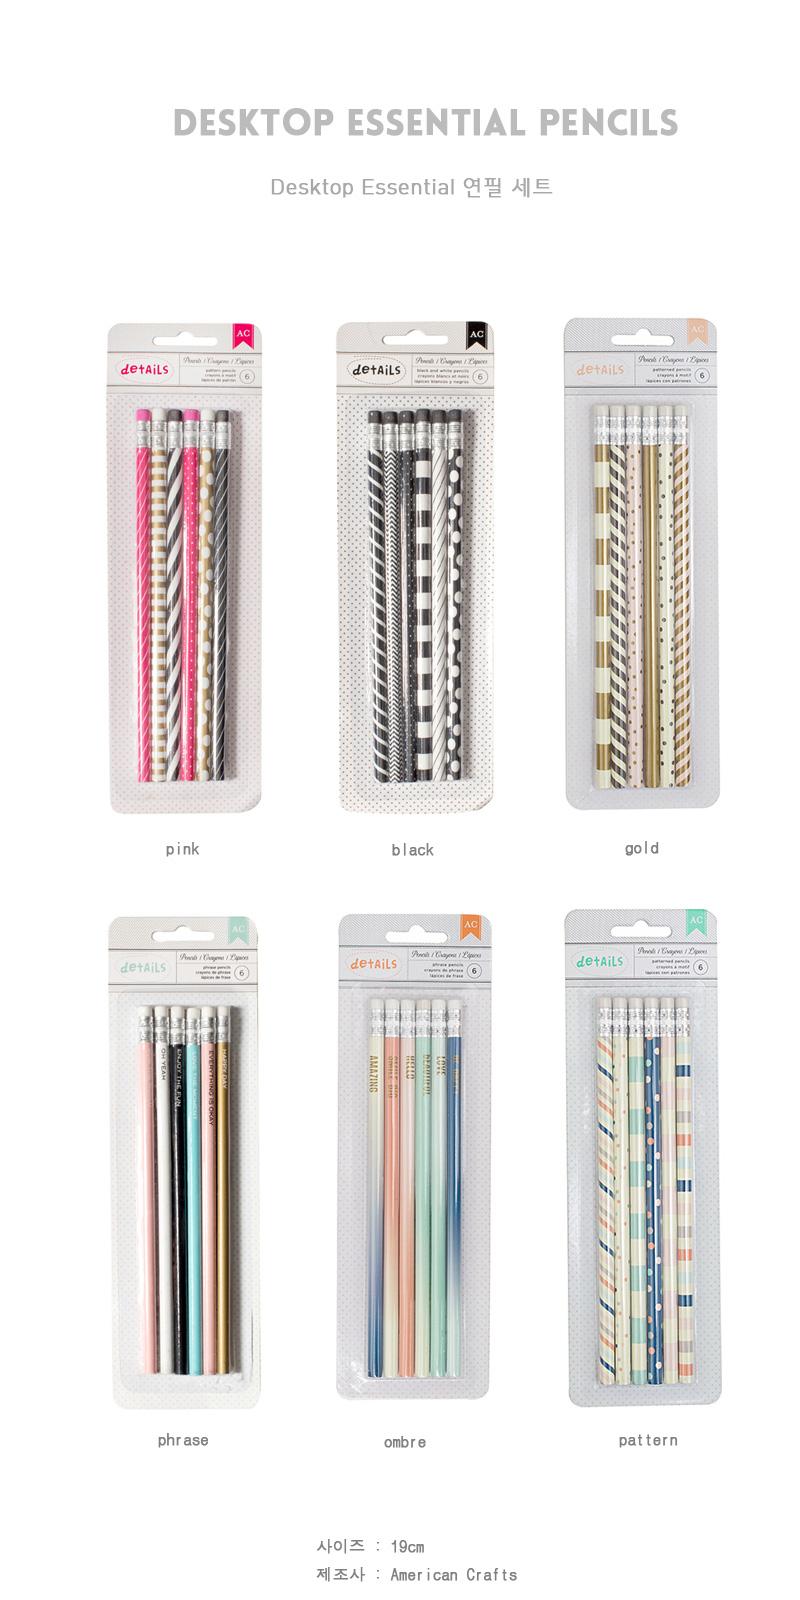 Desktop Essential 연필 세트 - 달링데이, 9,500원, 연필, 연필세트